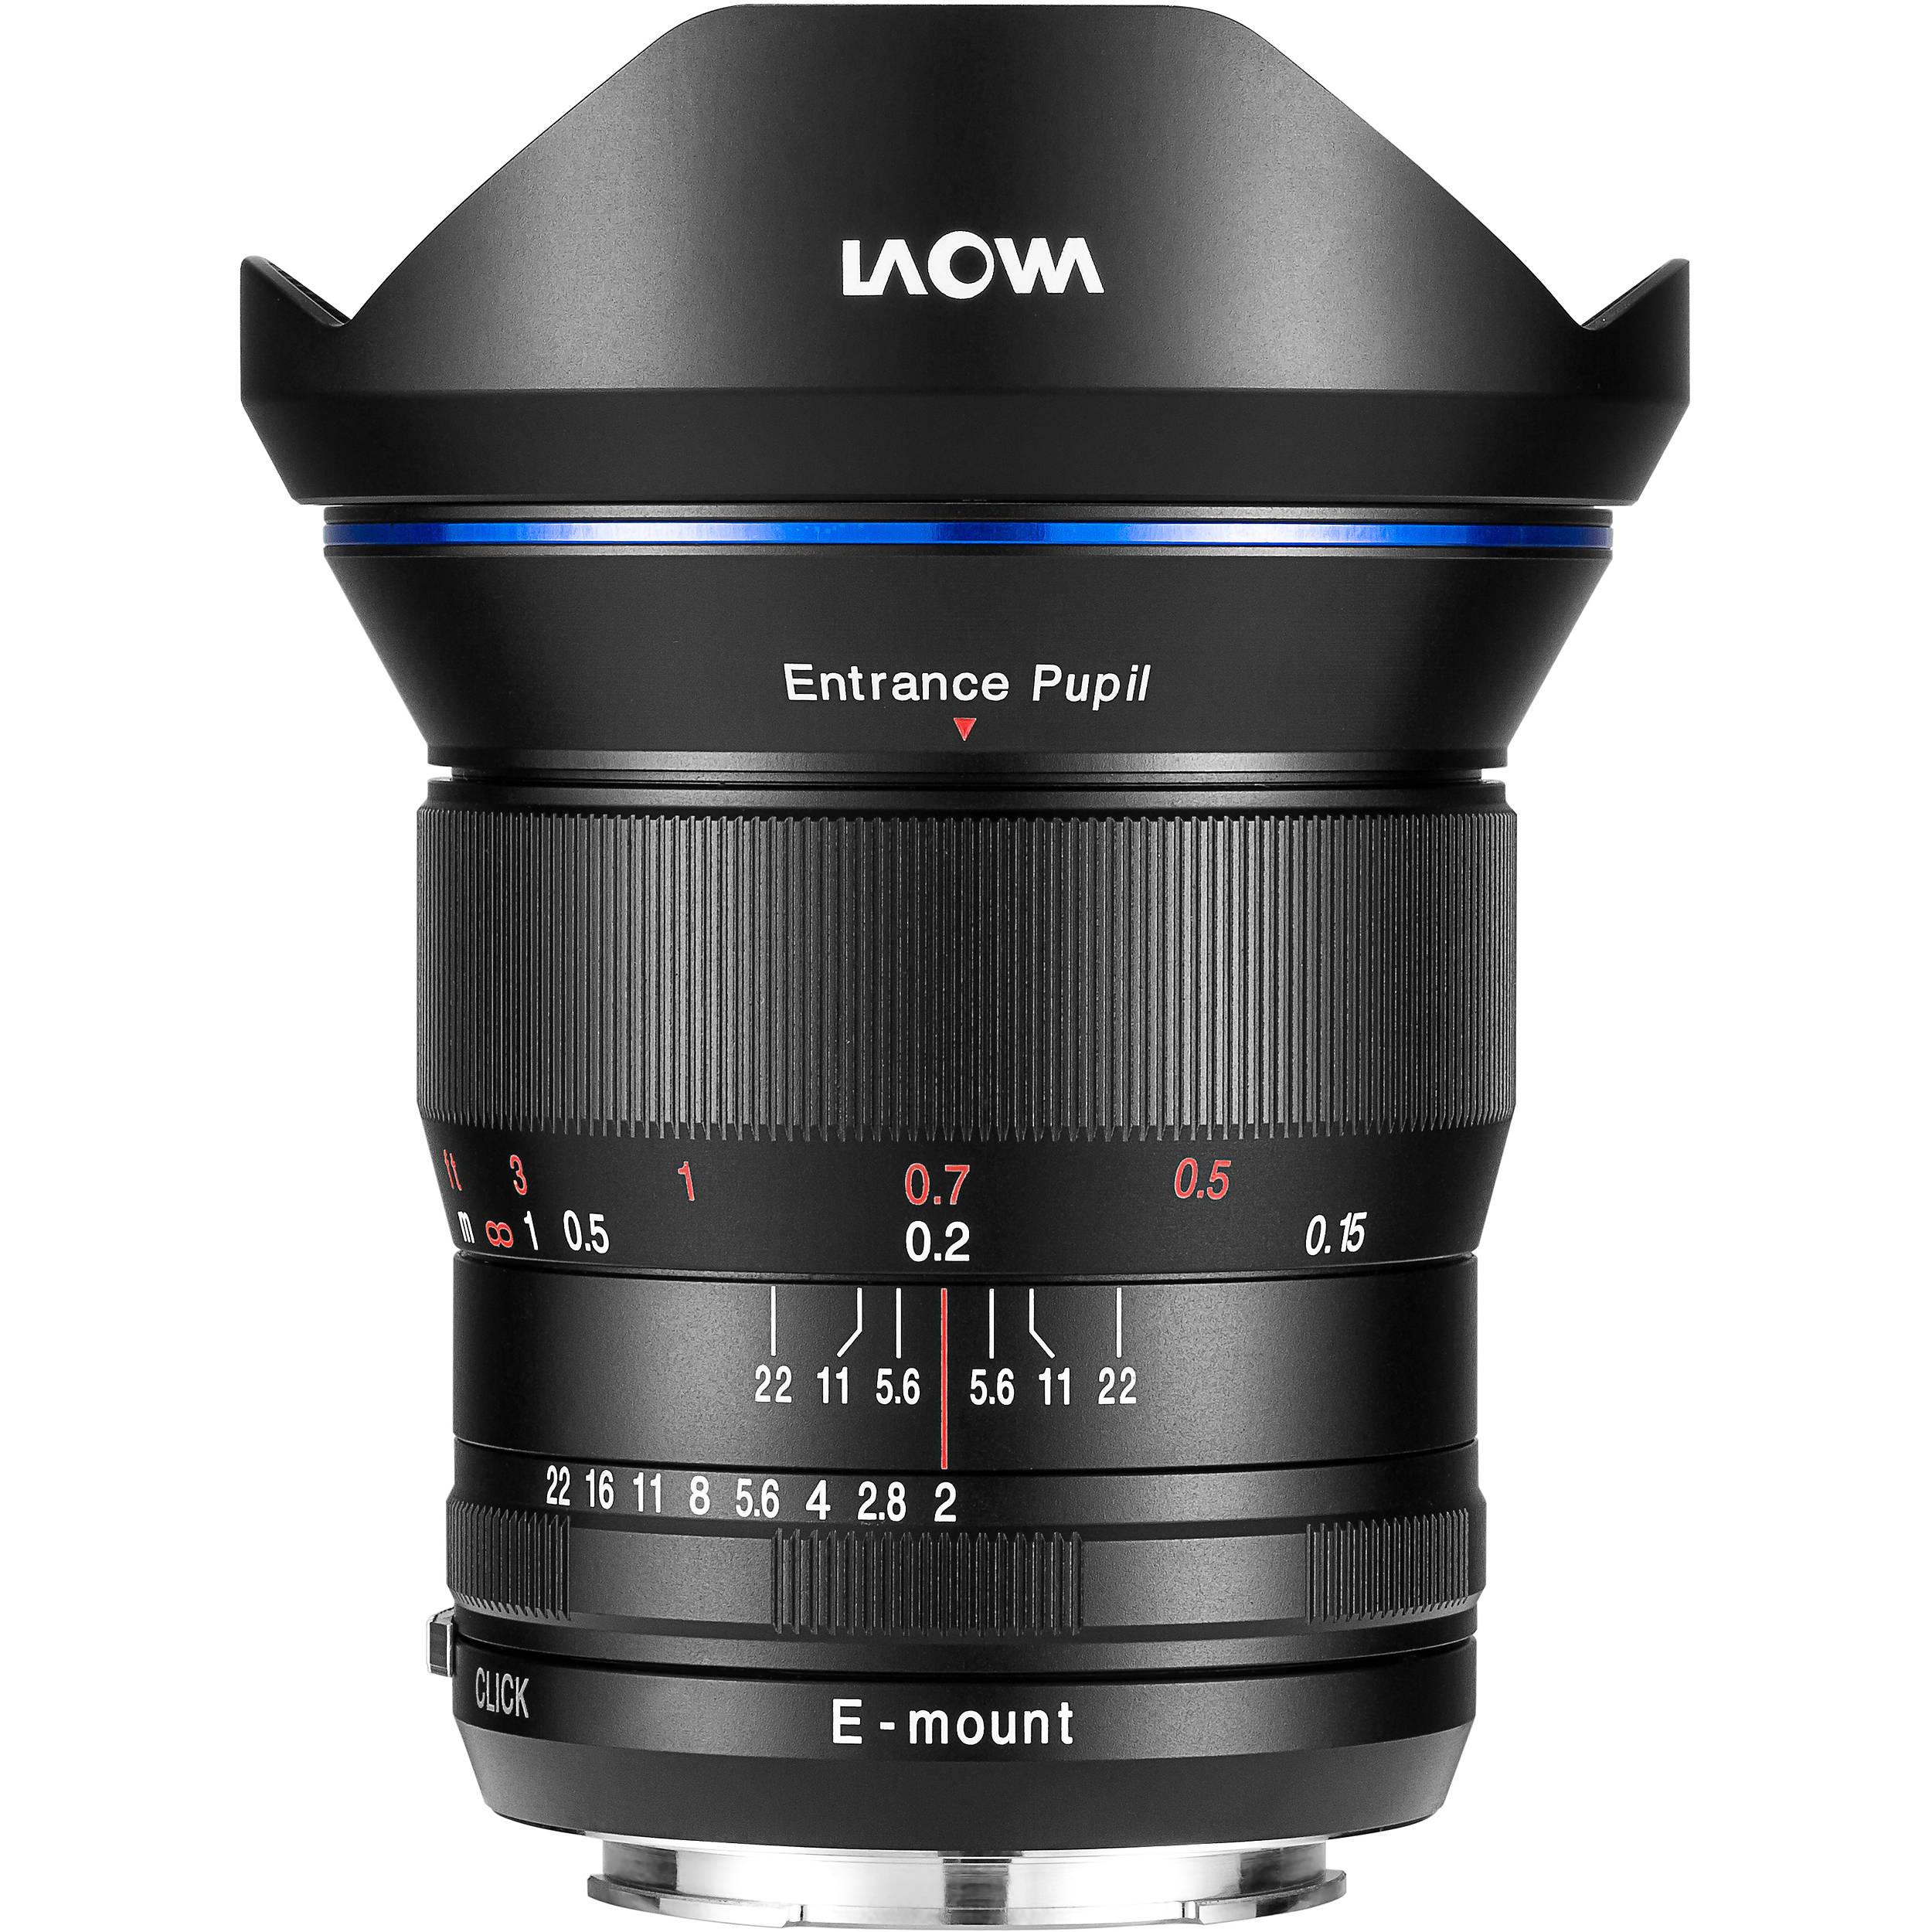 Venus Optics Laowa 15mm f 2 FE Zero D Lens for Sony E